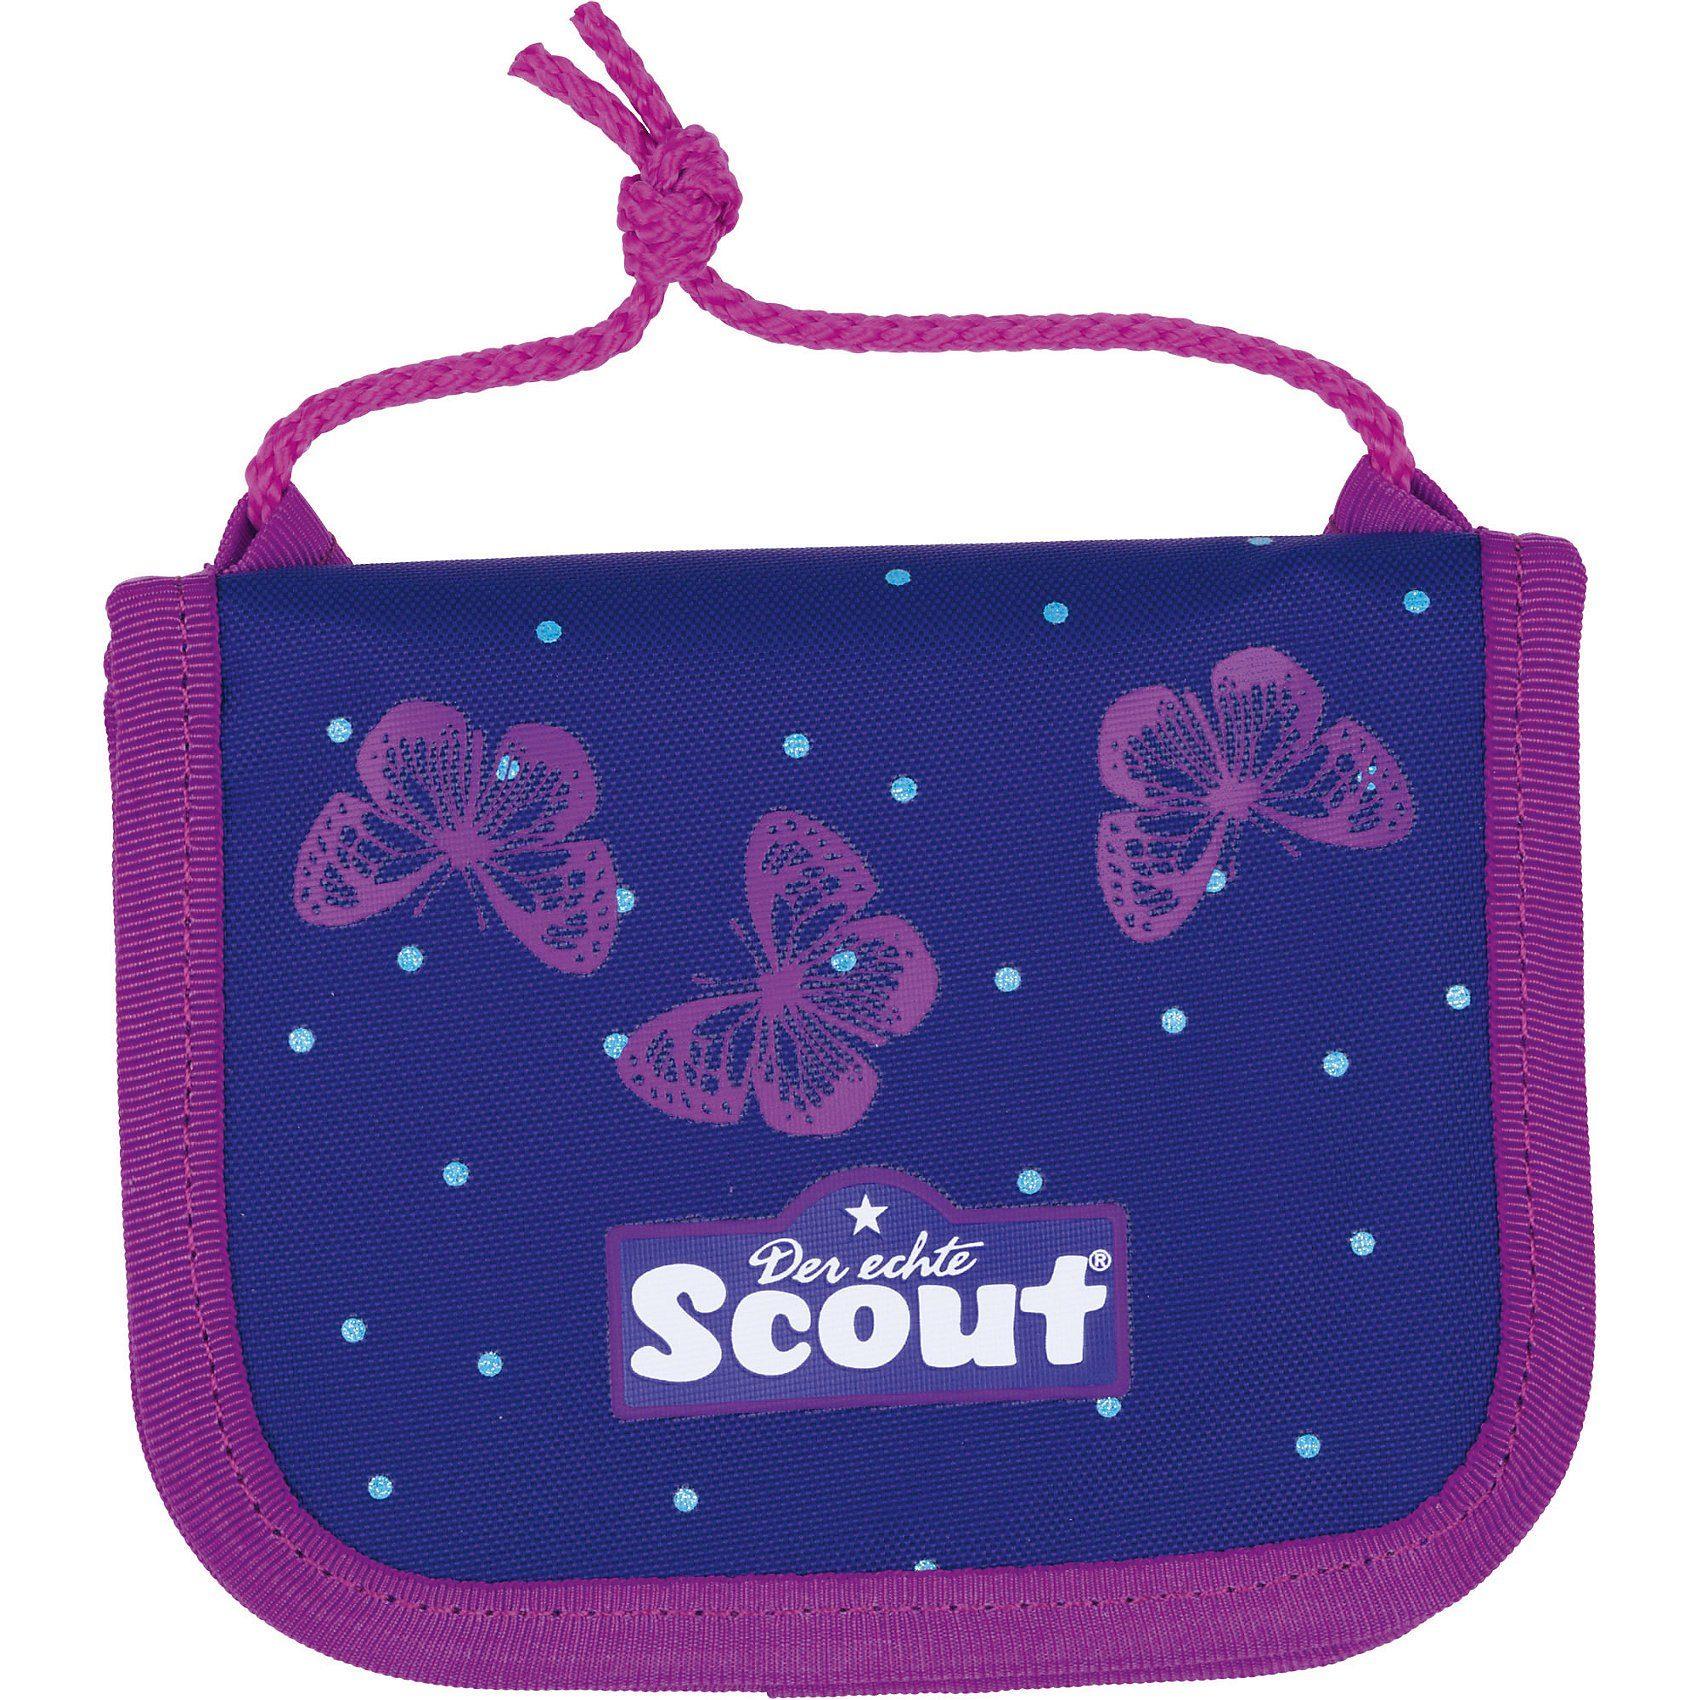 Scout Brustbeutel EXKLUSIV Cool Girl (Kollektion 2019)